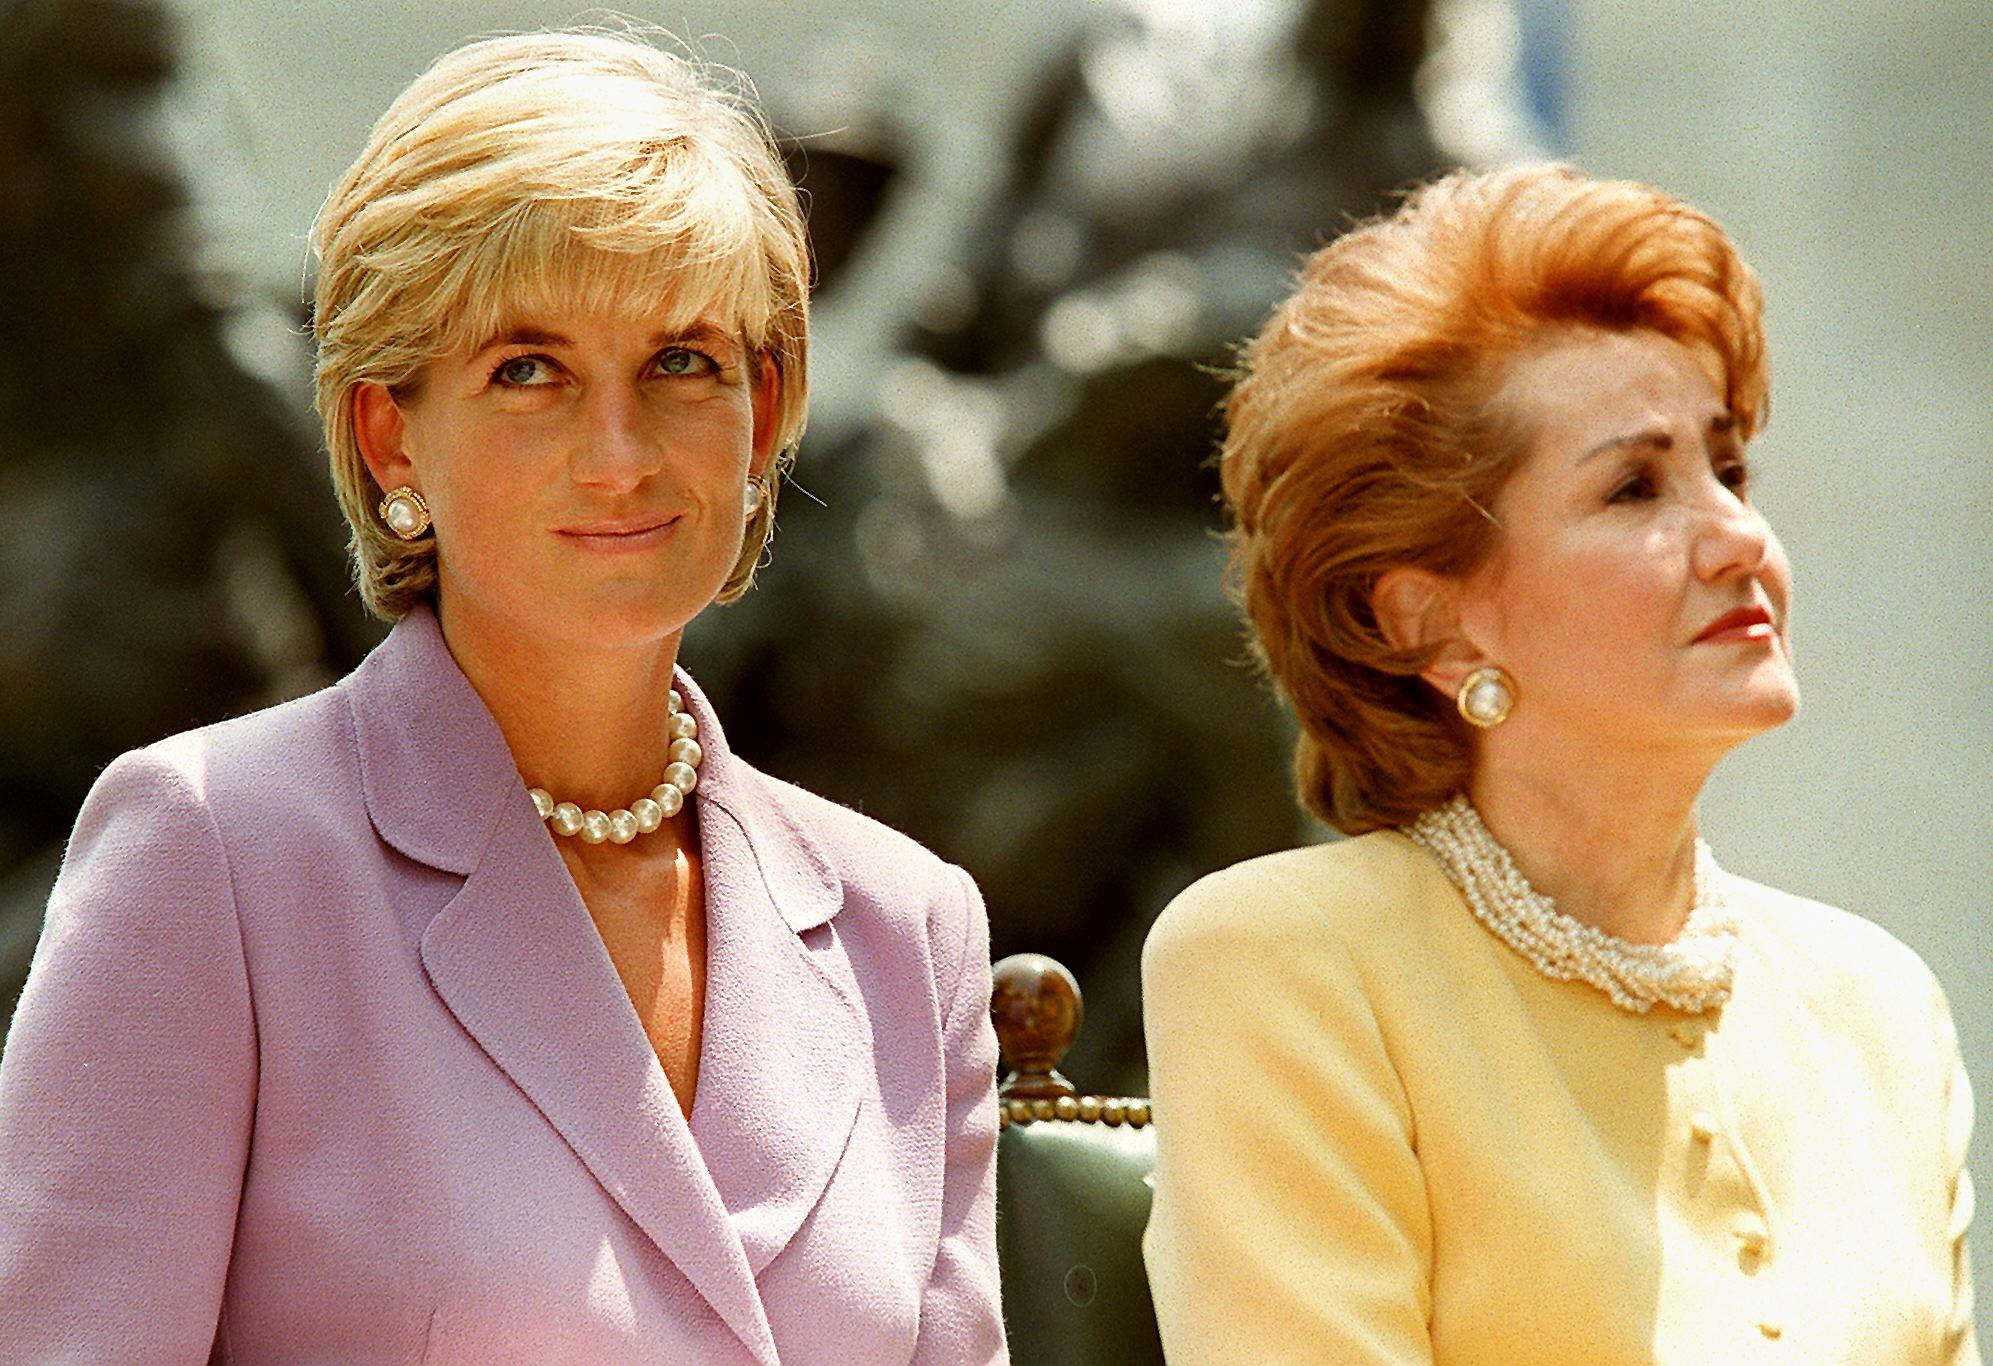 princess diana in a purple blazer next to elizabeth dole in a yellow one